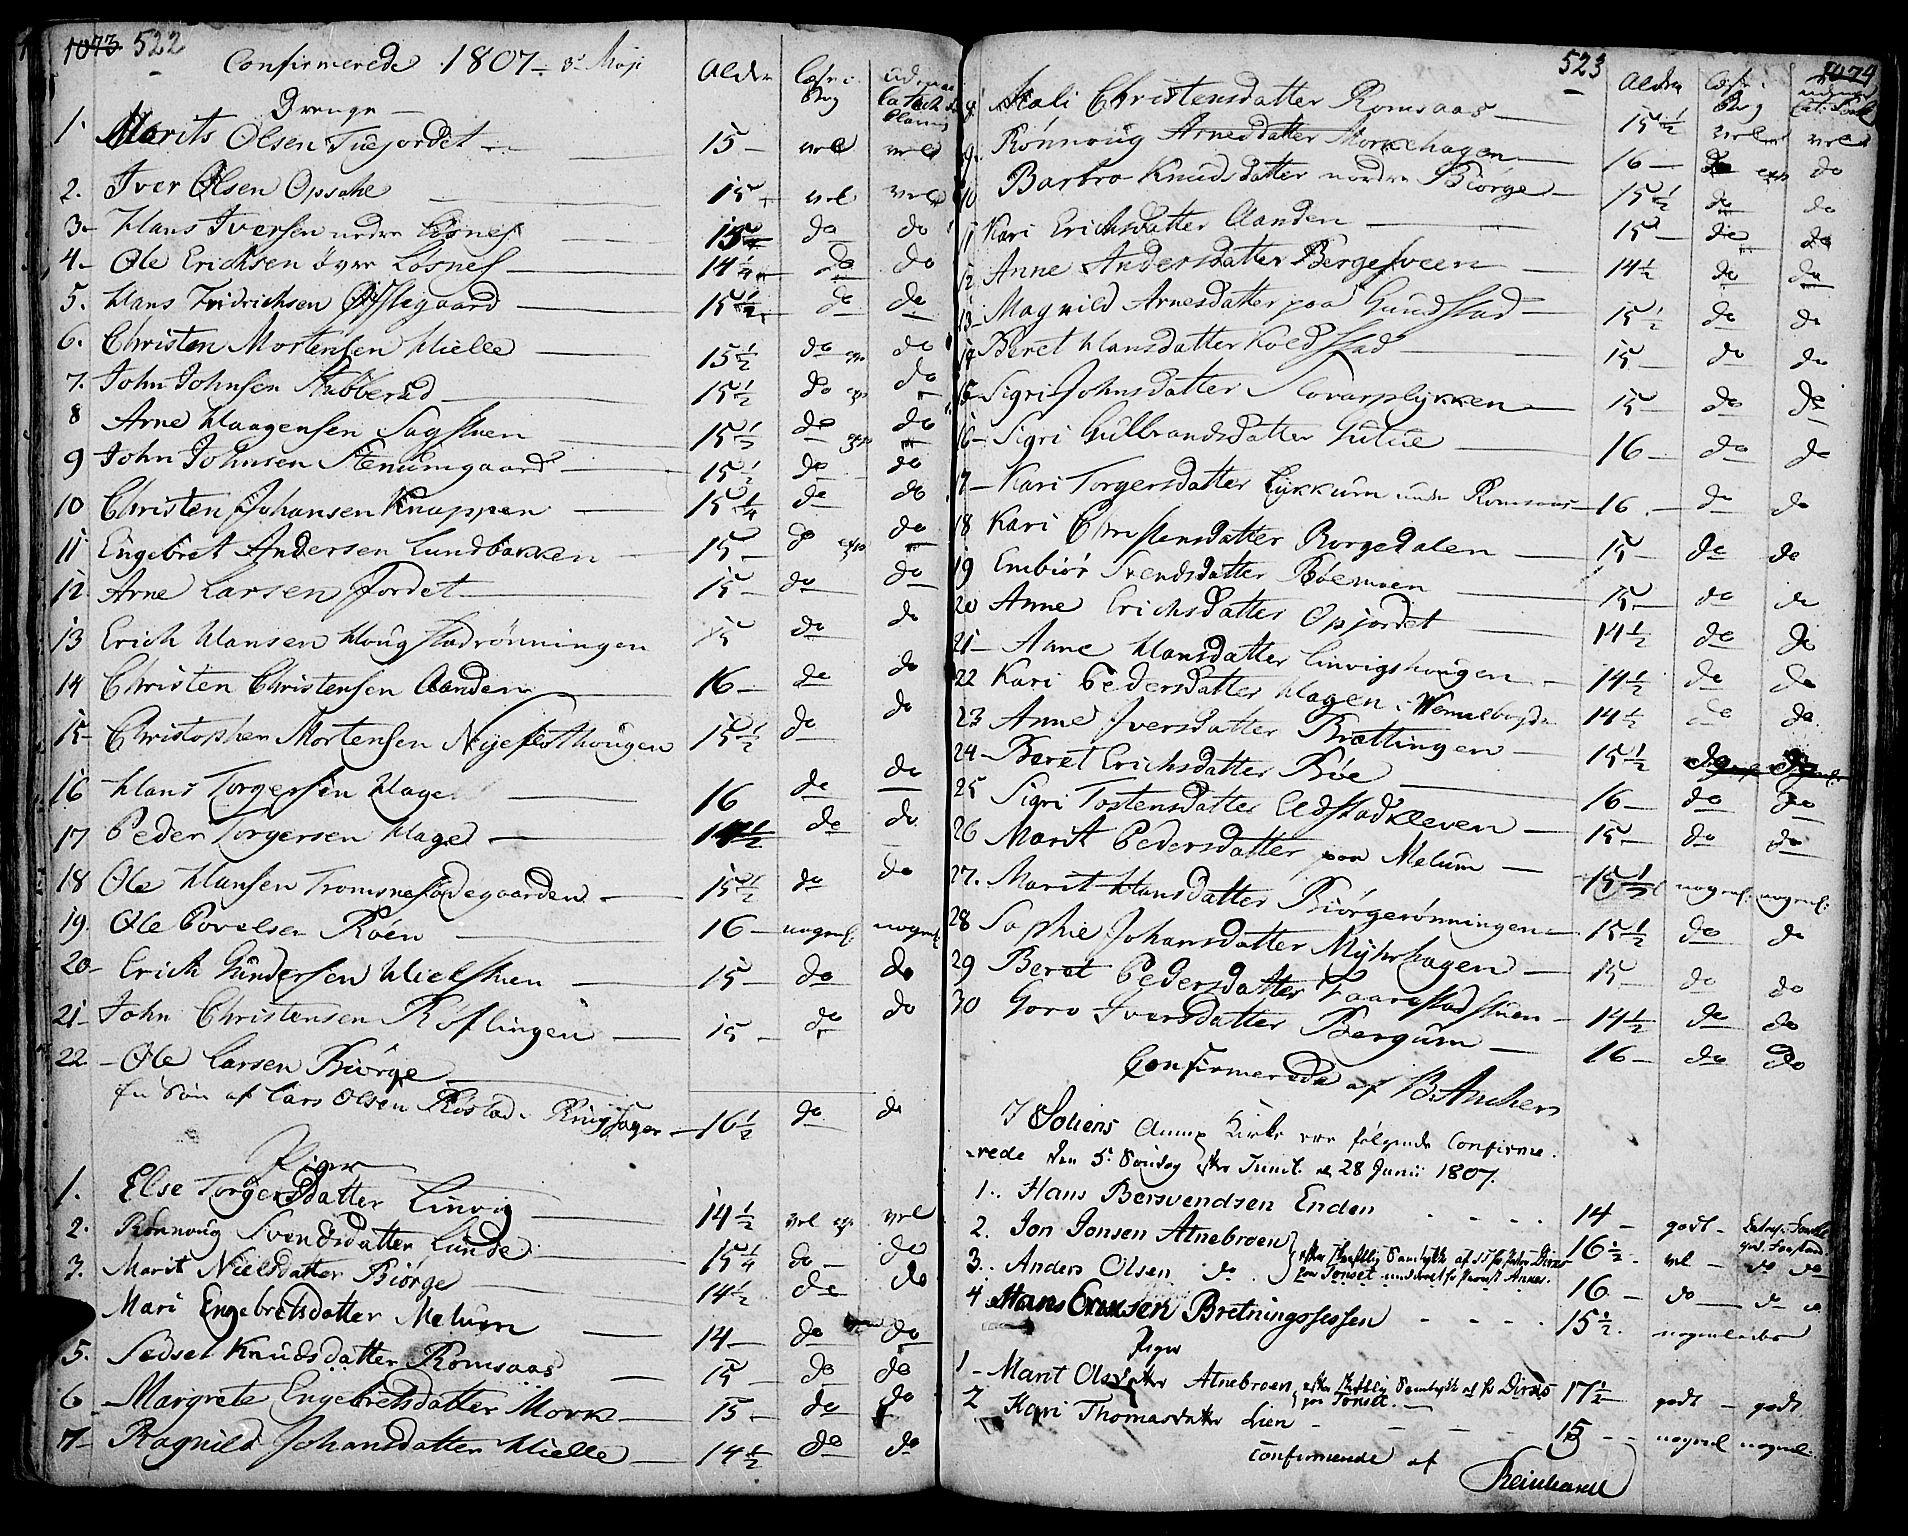 SAH, Ringebu prestekontor, Ministerialbok nr. 3, 1781-1820, s. 522-523